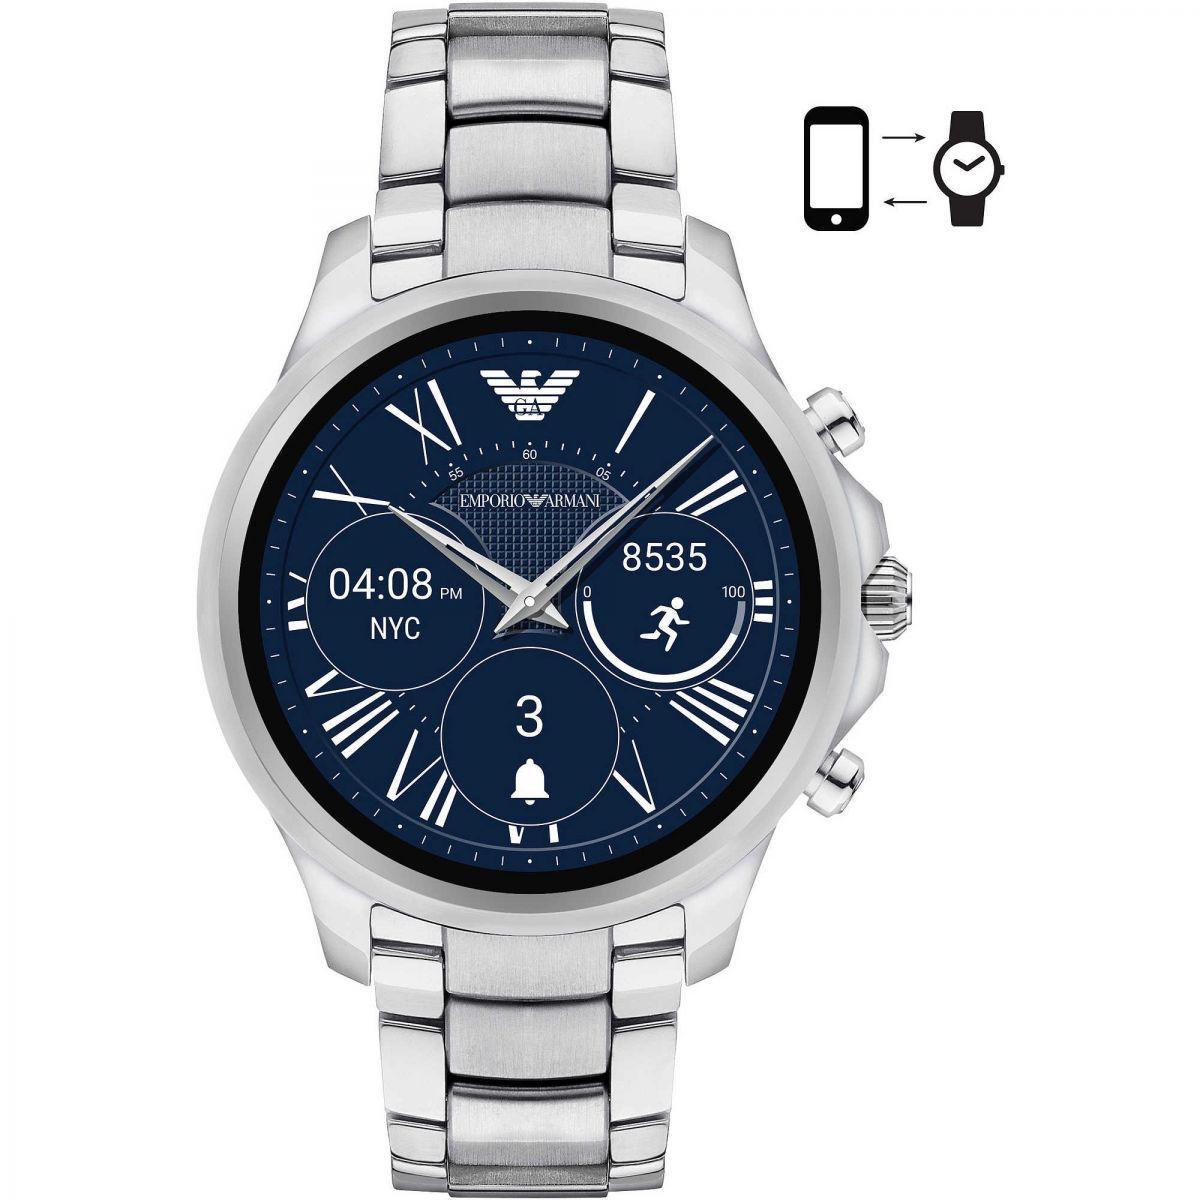 cc940faf48 Orologio Smartwatch Emporio Armani Connected ART5000 in Acciaio